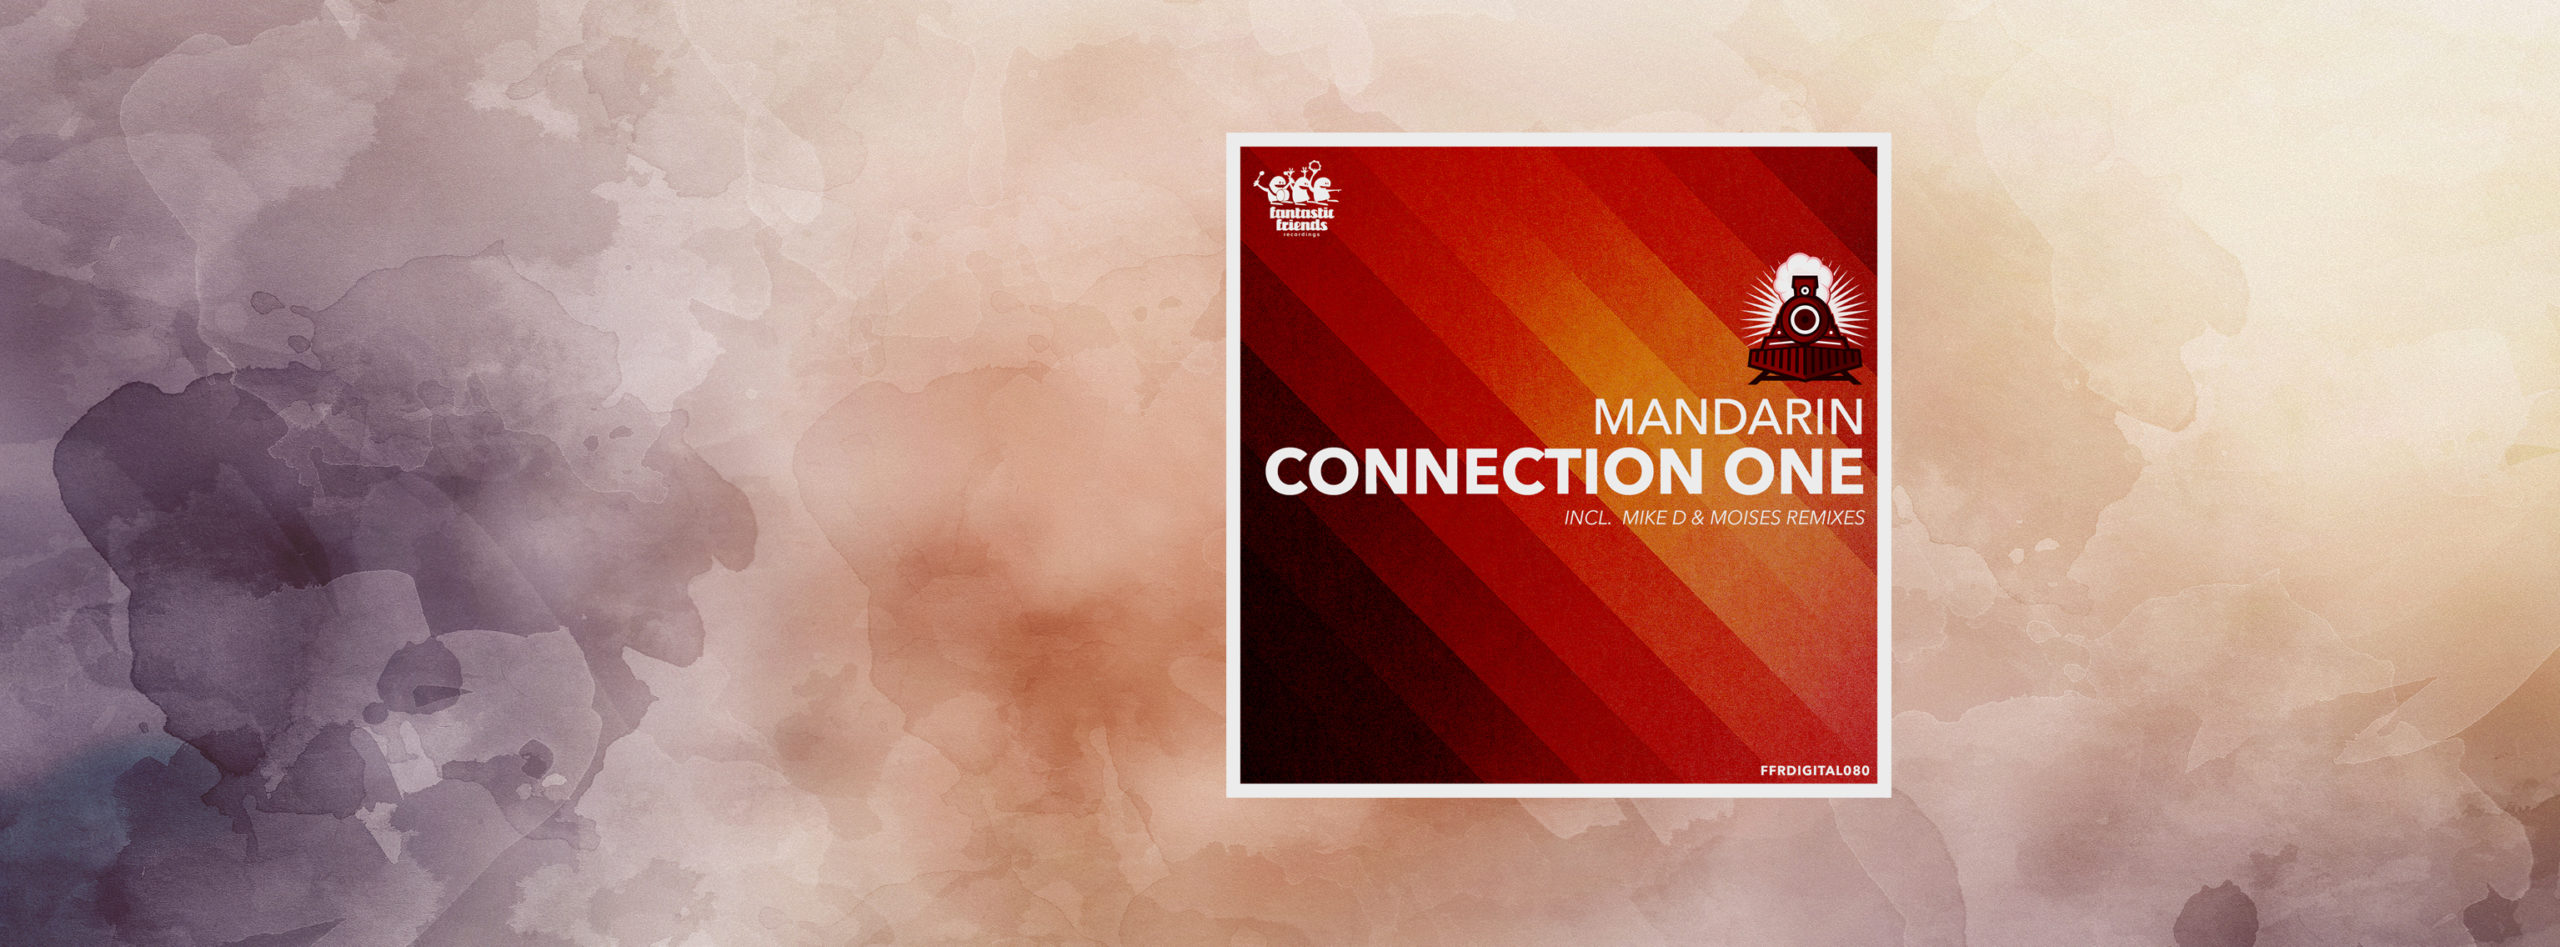 MANDARIN CONNECTION ONE